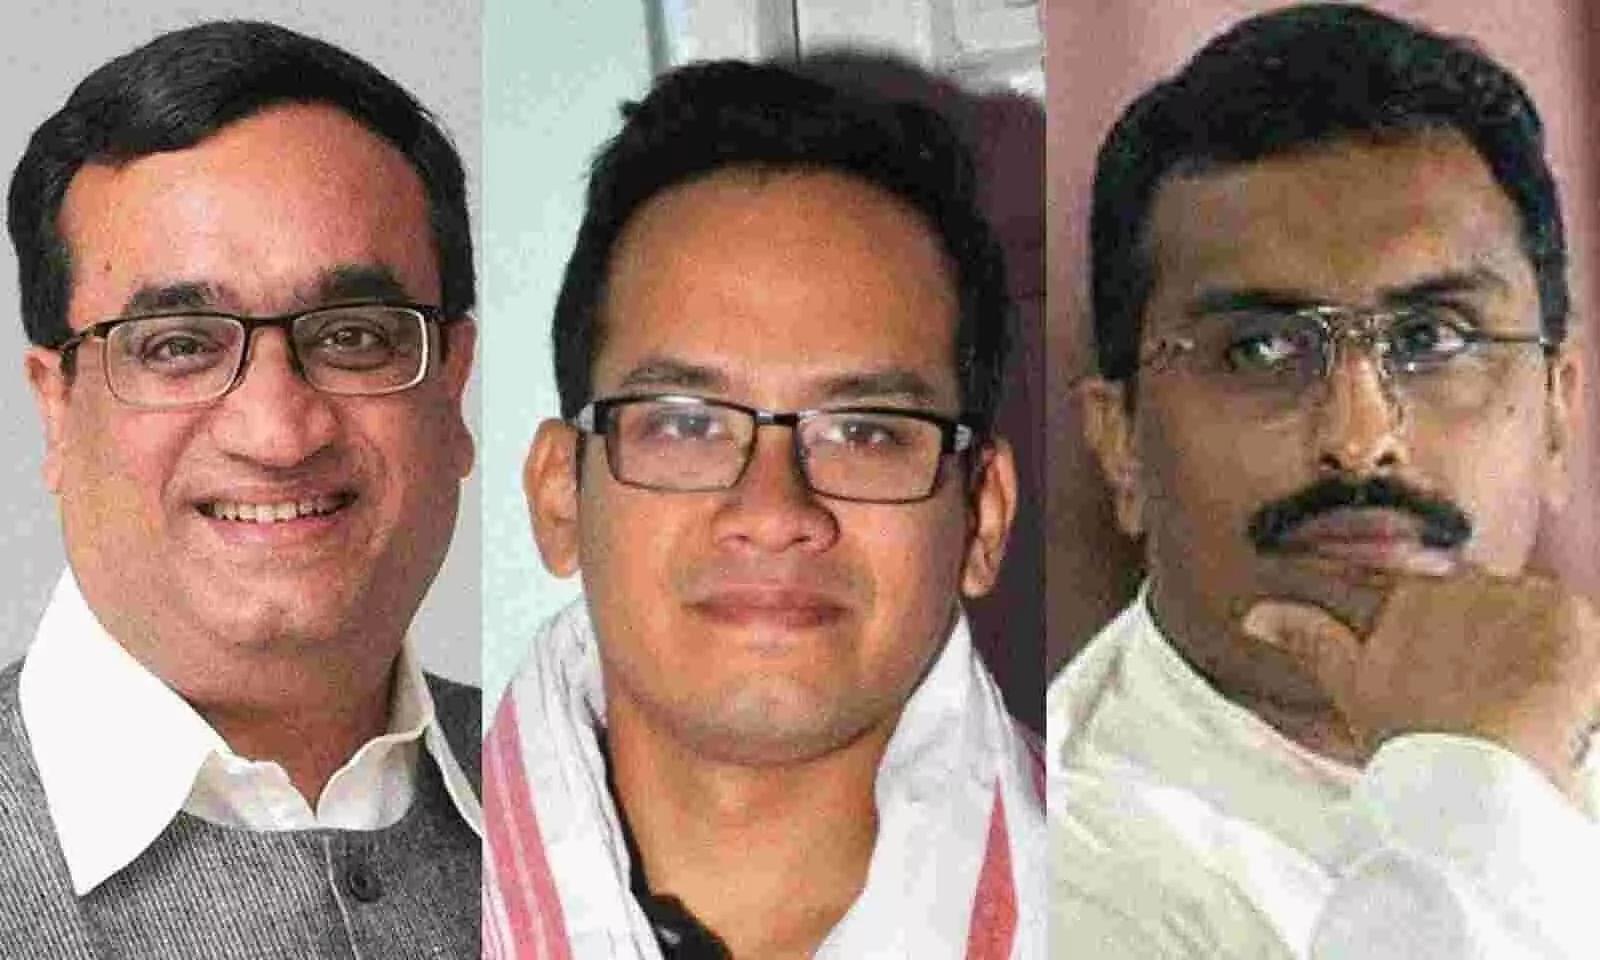 BJPs Ram Madhav gets into Twitter war with Congress Gaurav Gogoi & Ajay Maken. Heres why